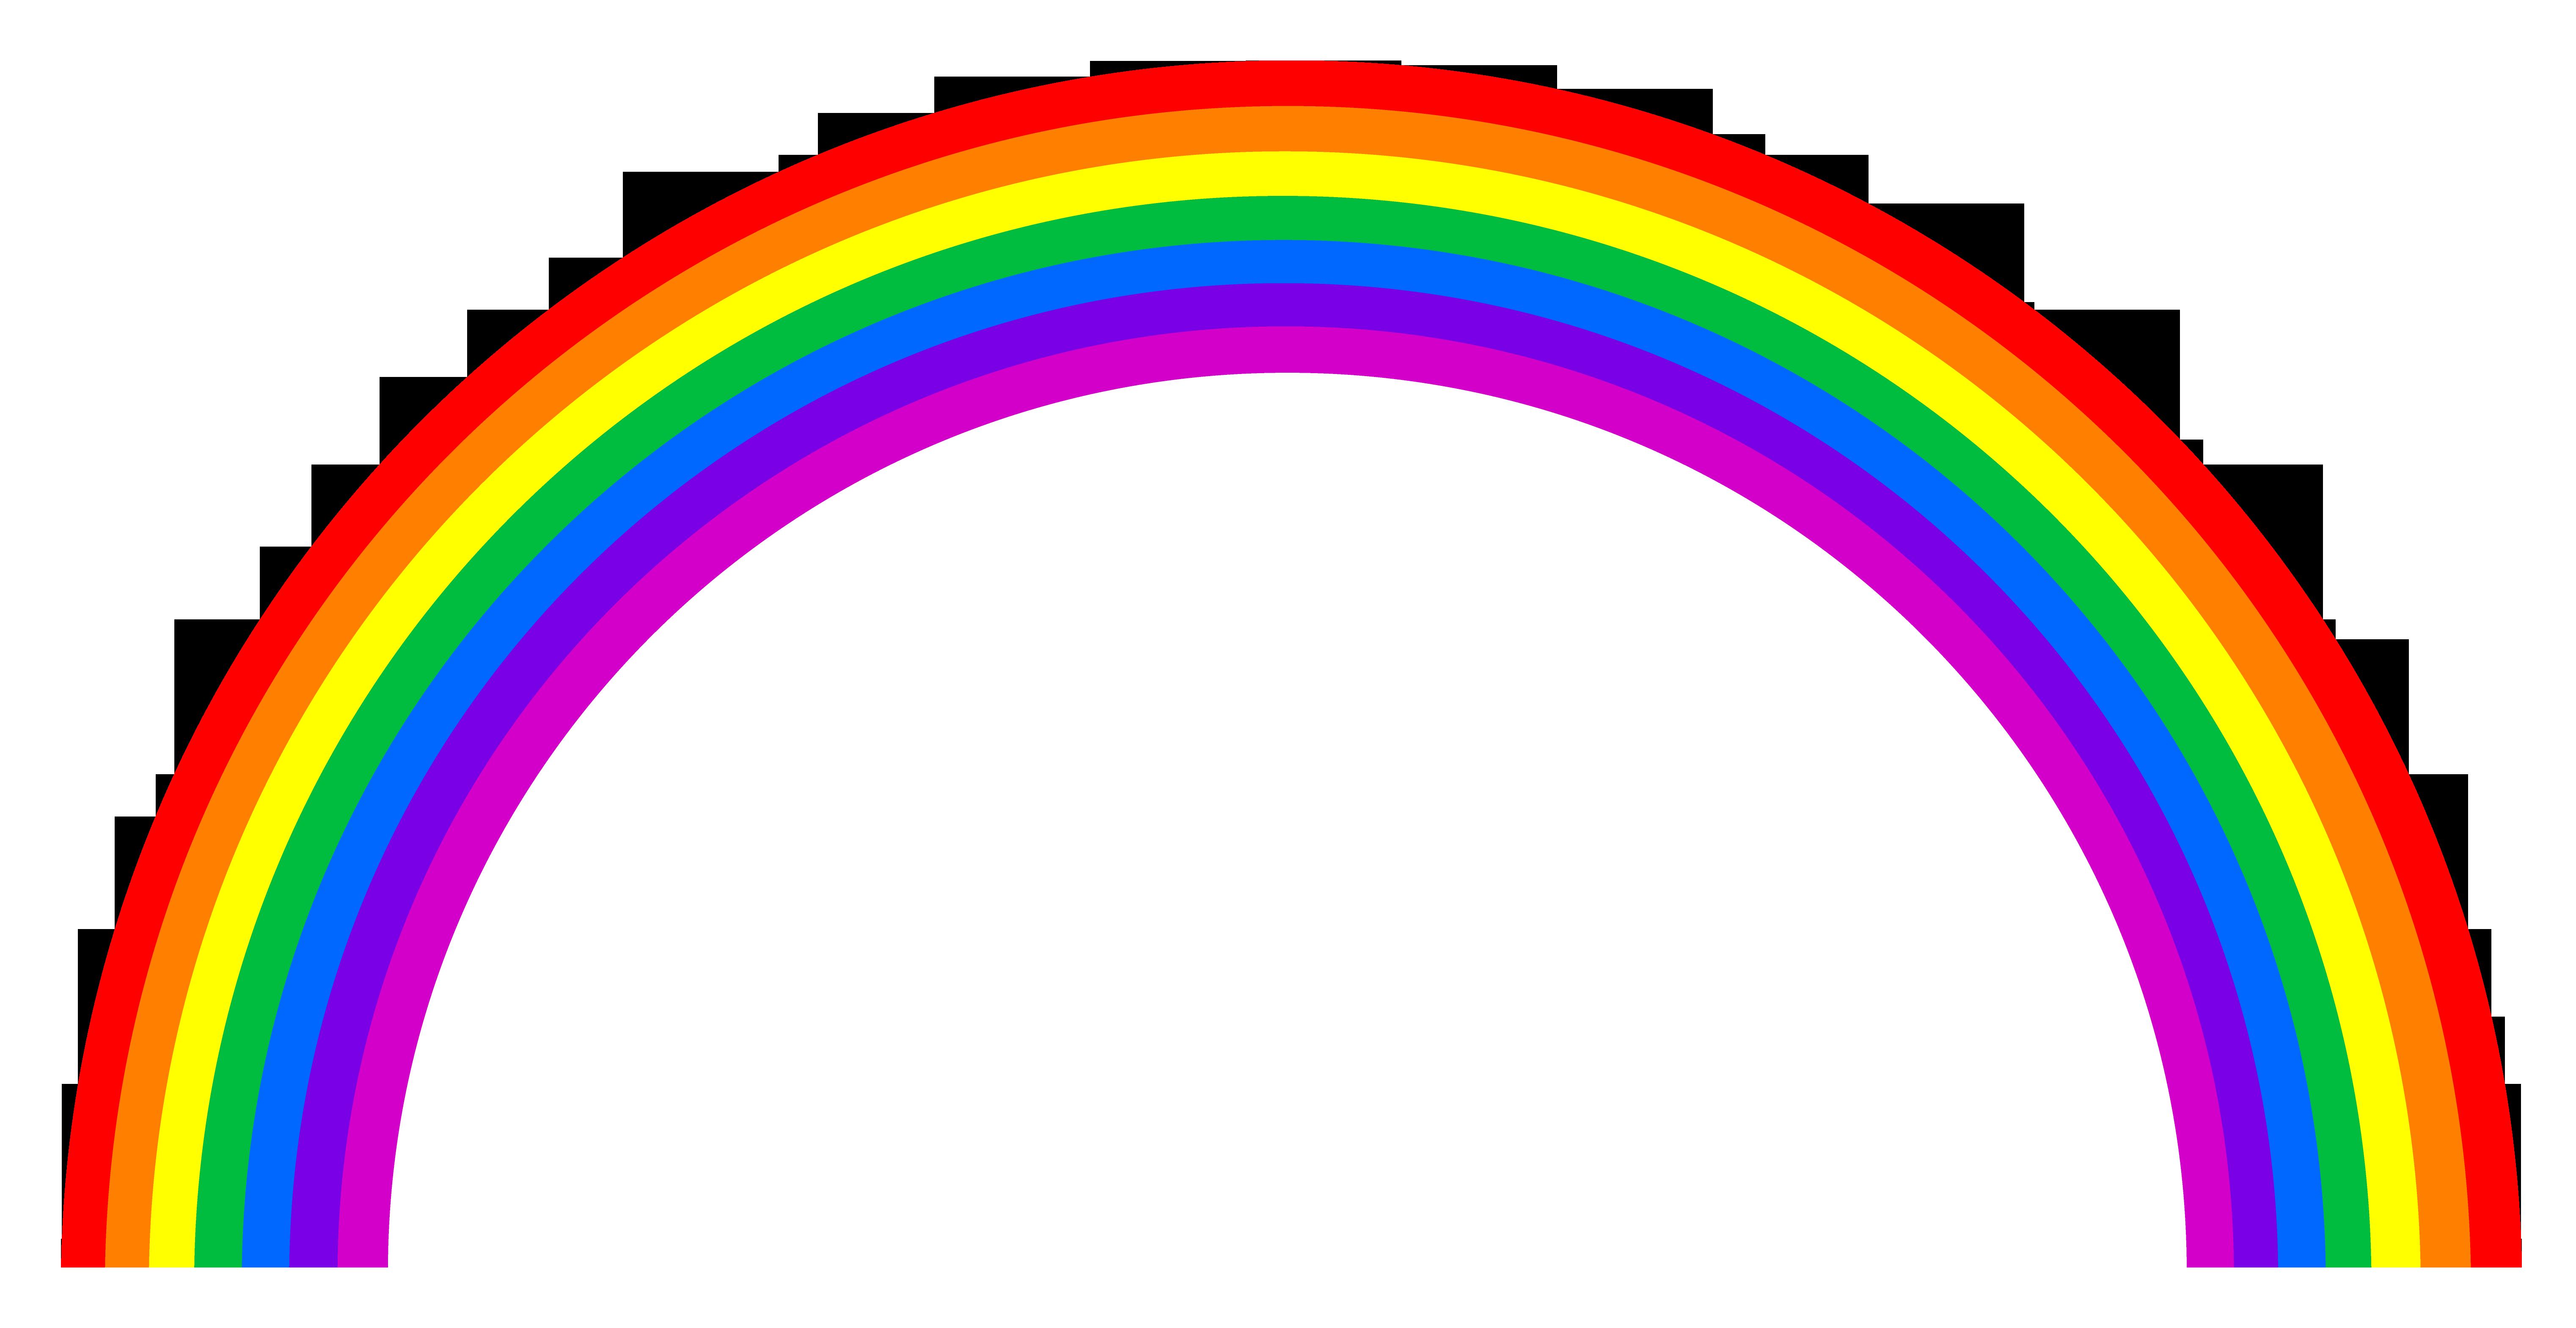 Hd - Rainbow HD PNG